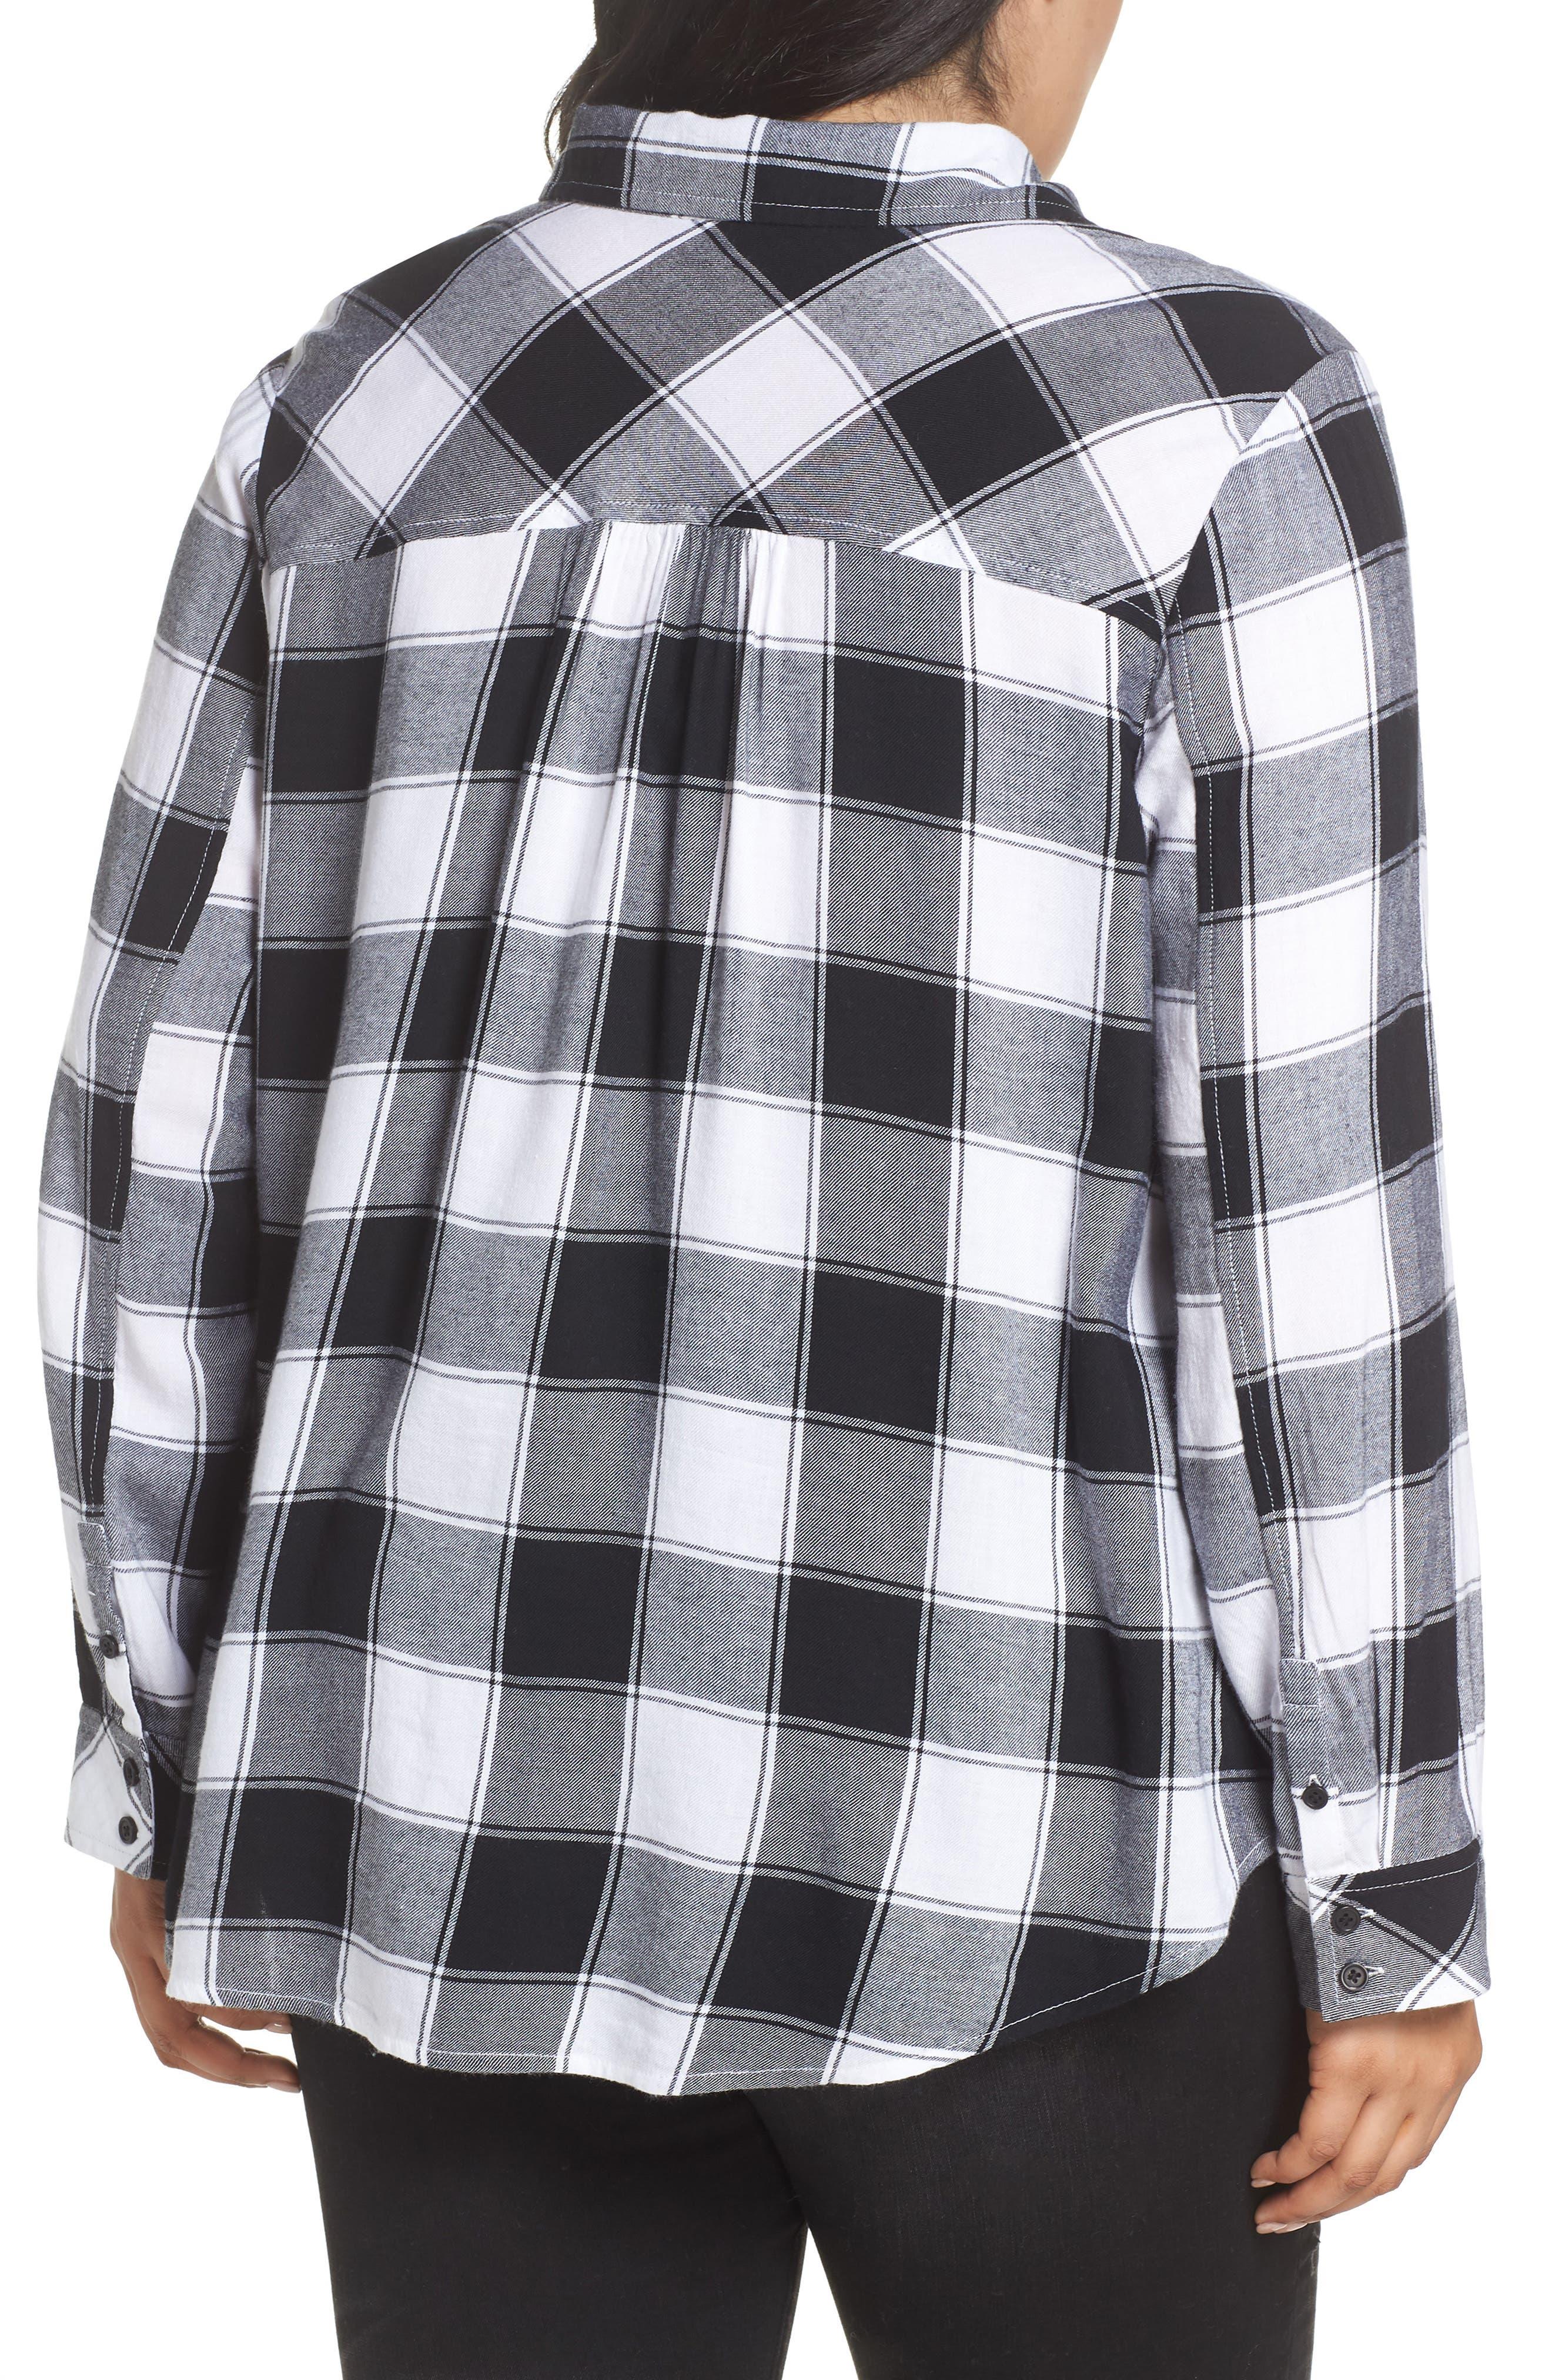 Plaid Shirt,                             Alternate thumbnail 2, color,                             BLACK DALEY PLAID